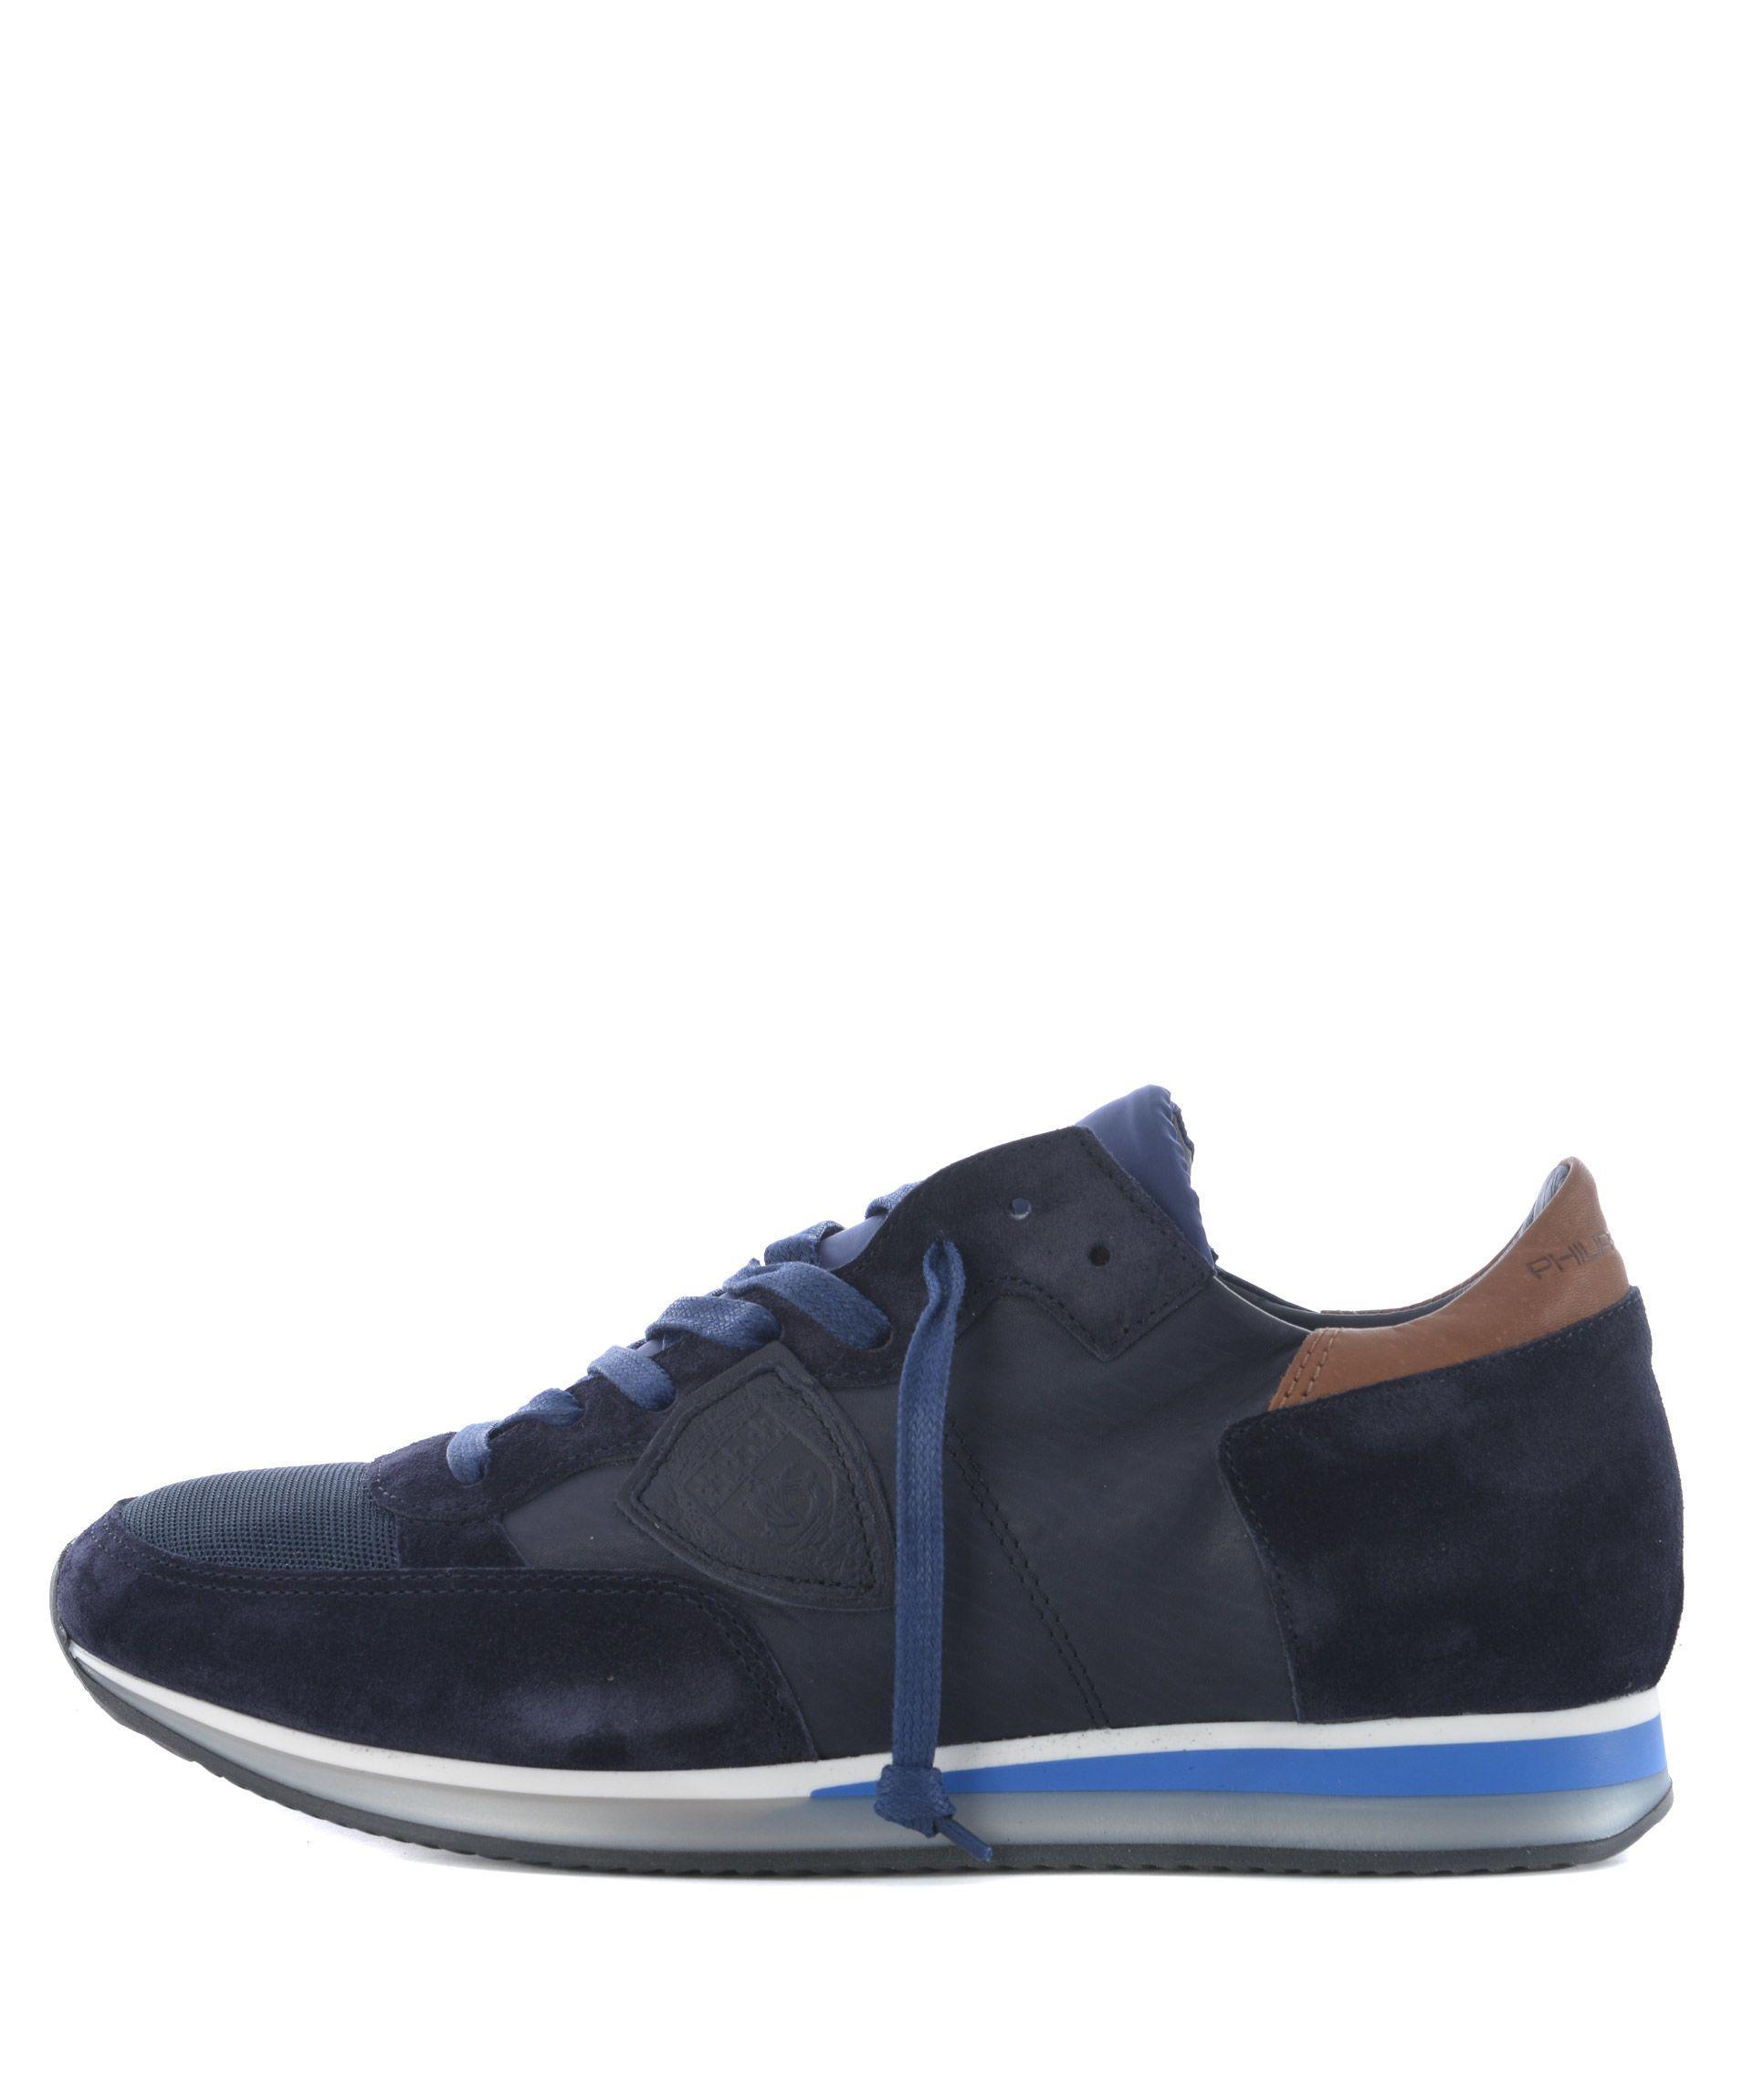 Philippe Model Tropez Sneakers In Blu Scuro